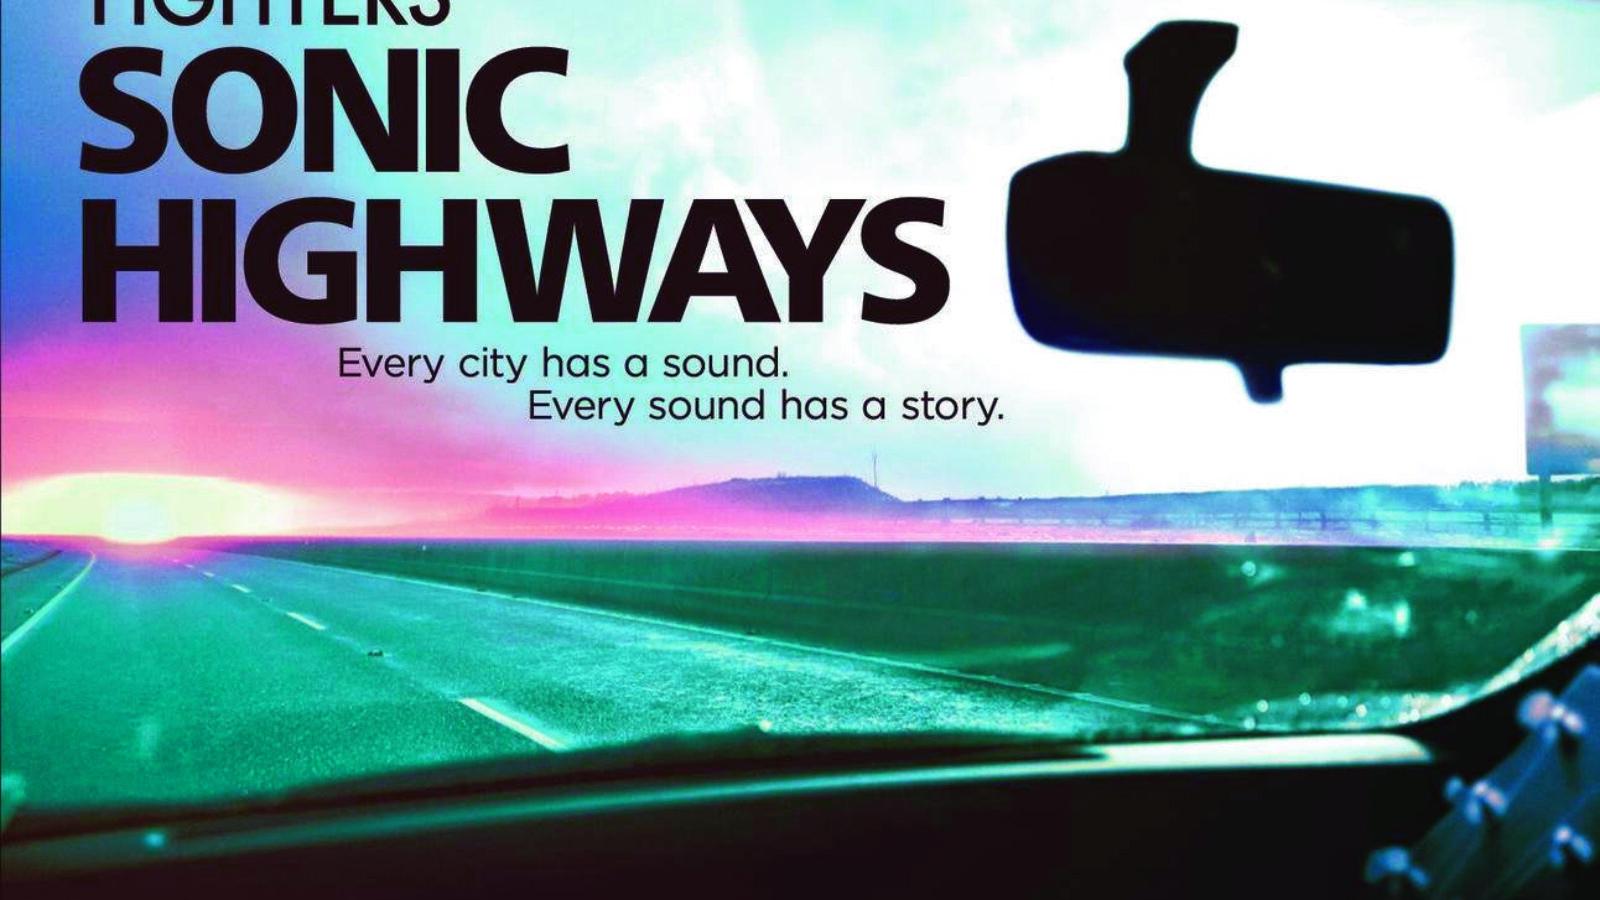 OXMOX Special-Tipp: FOO FIGHTERS – Sonic Highways (DVD, Blu-ray)